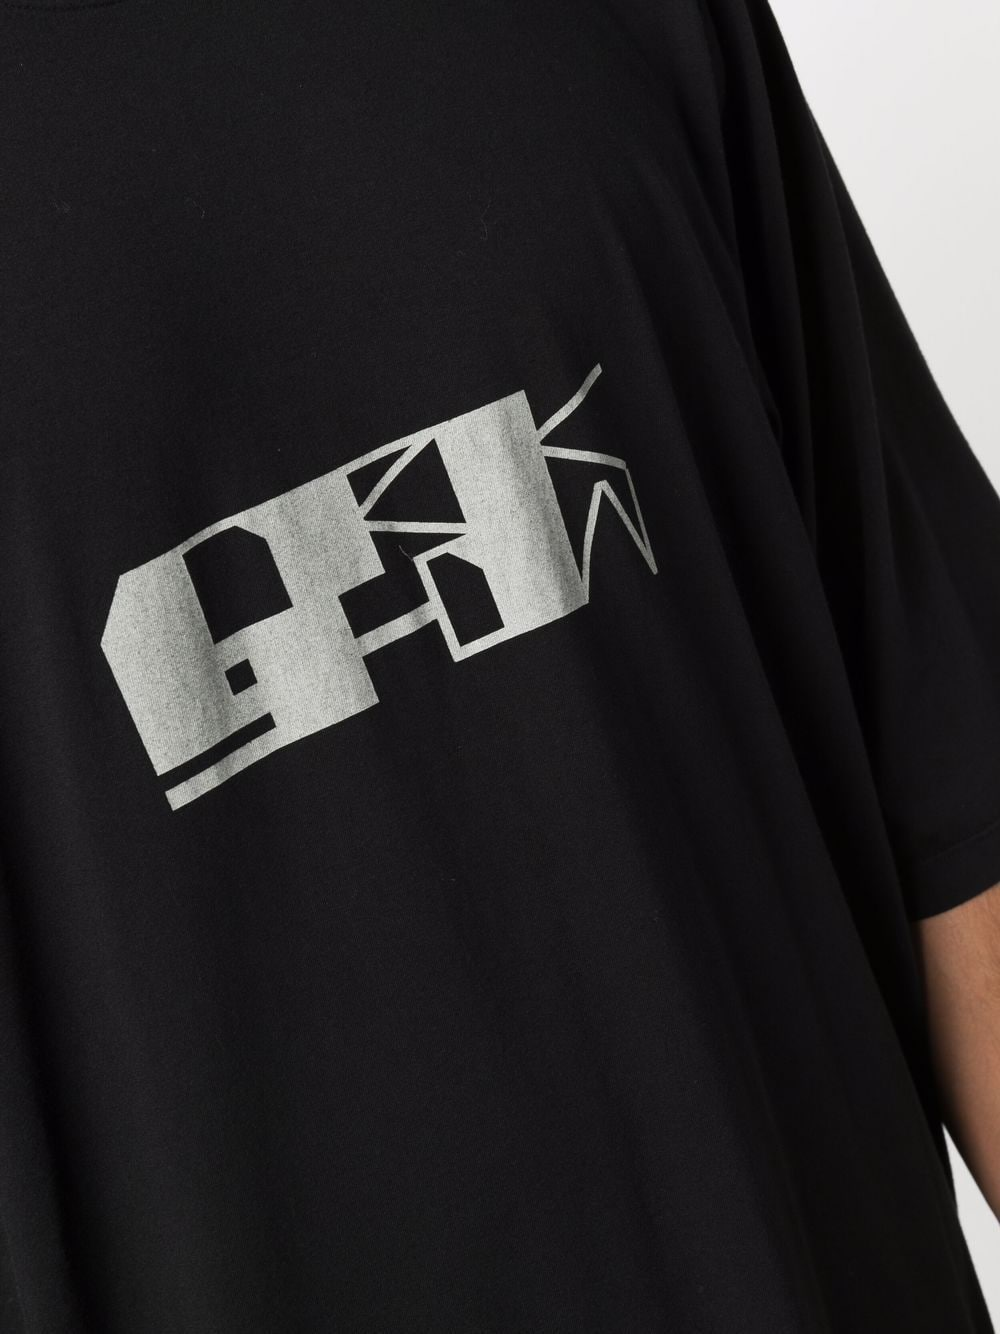 jumbo t-shirt man black in cotton RICK OWENS DRKSHDW   T-shirts   DU02A3274 RNEP40961